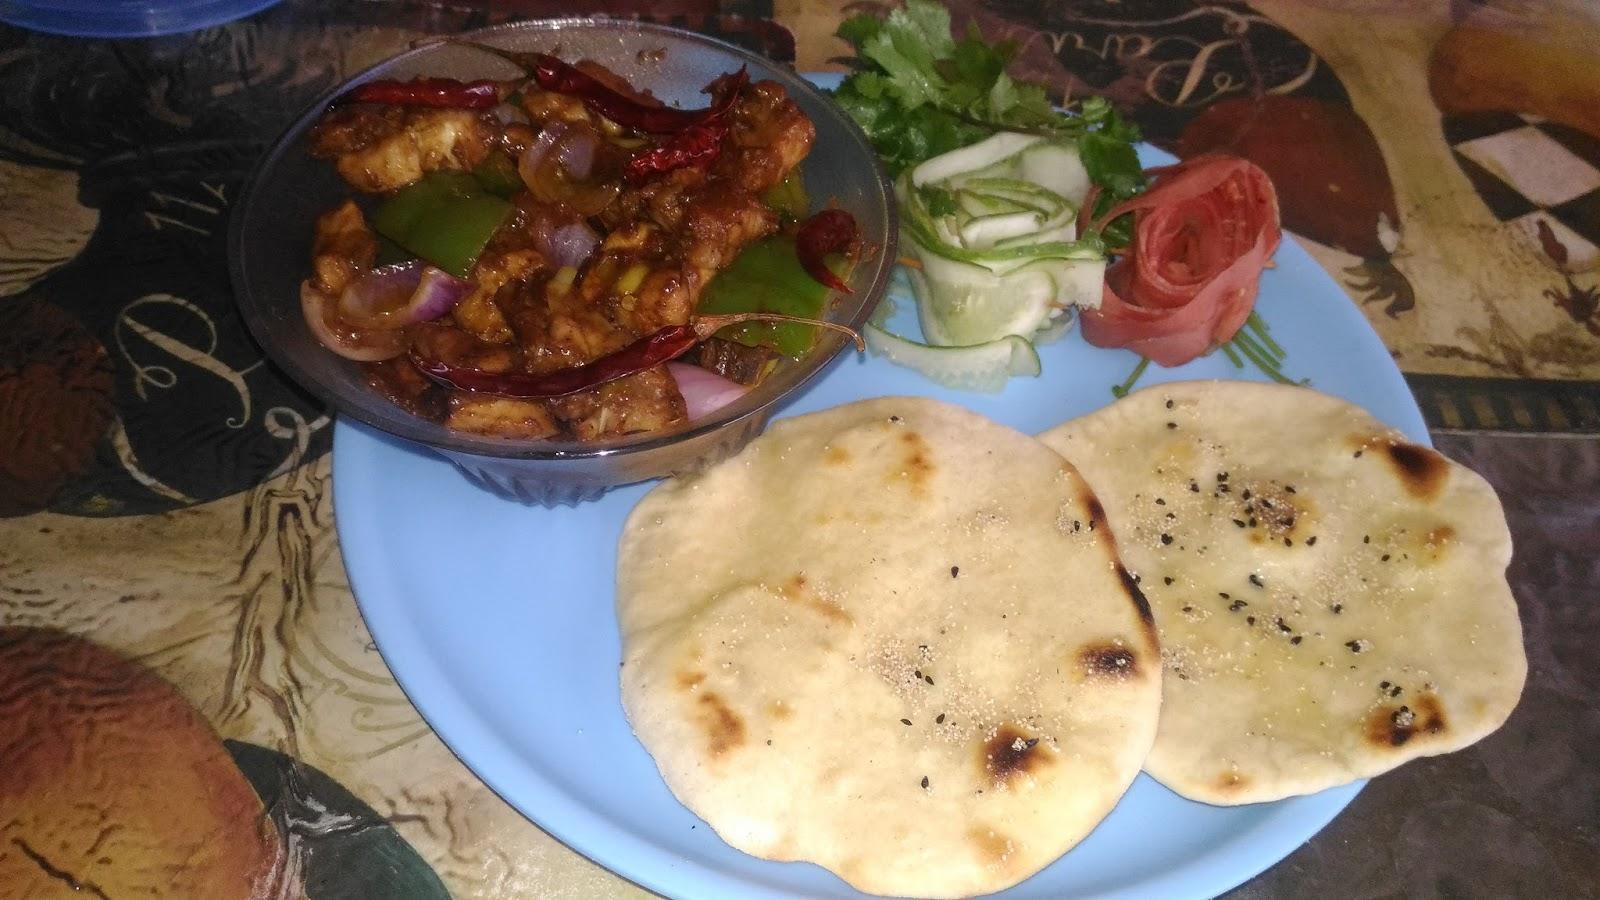 Indian food recipes indian recipes desi food desi recipes i went through tarla dalal recipe forumfinder Choice Image